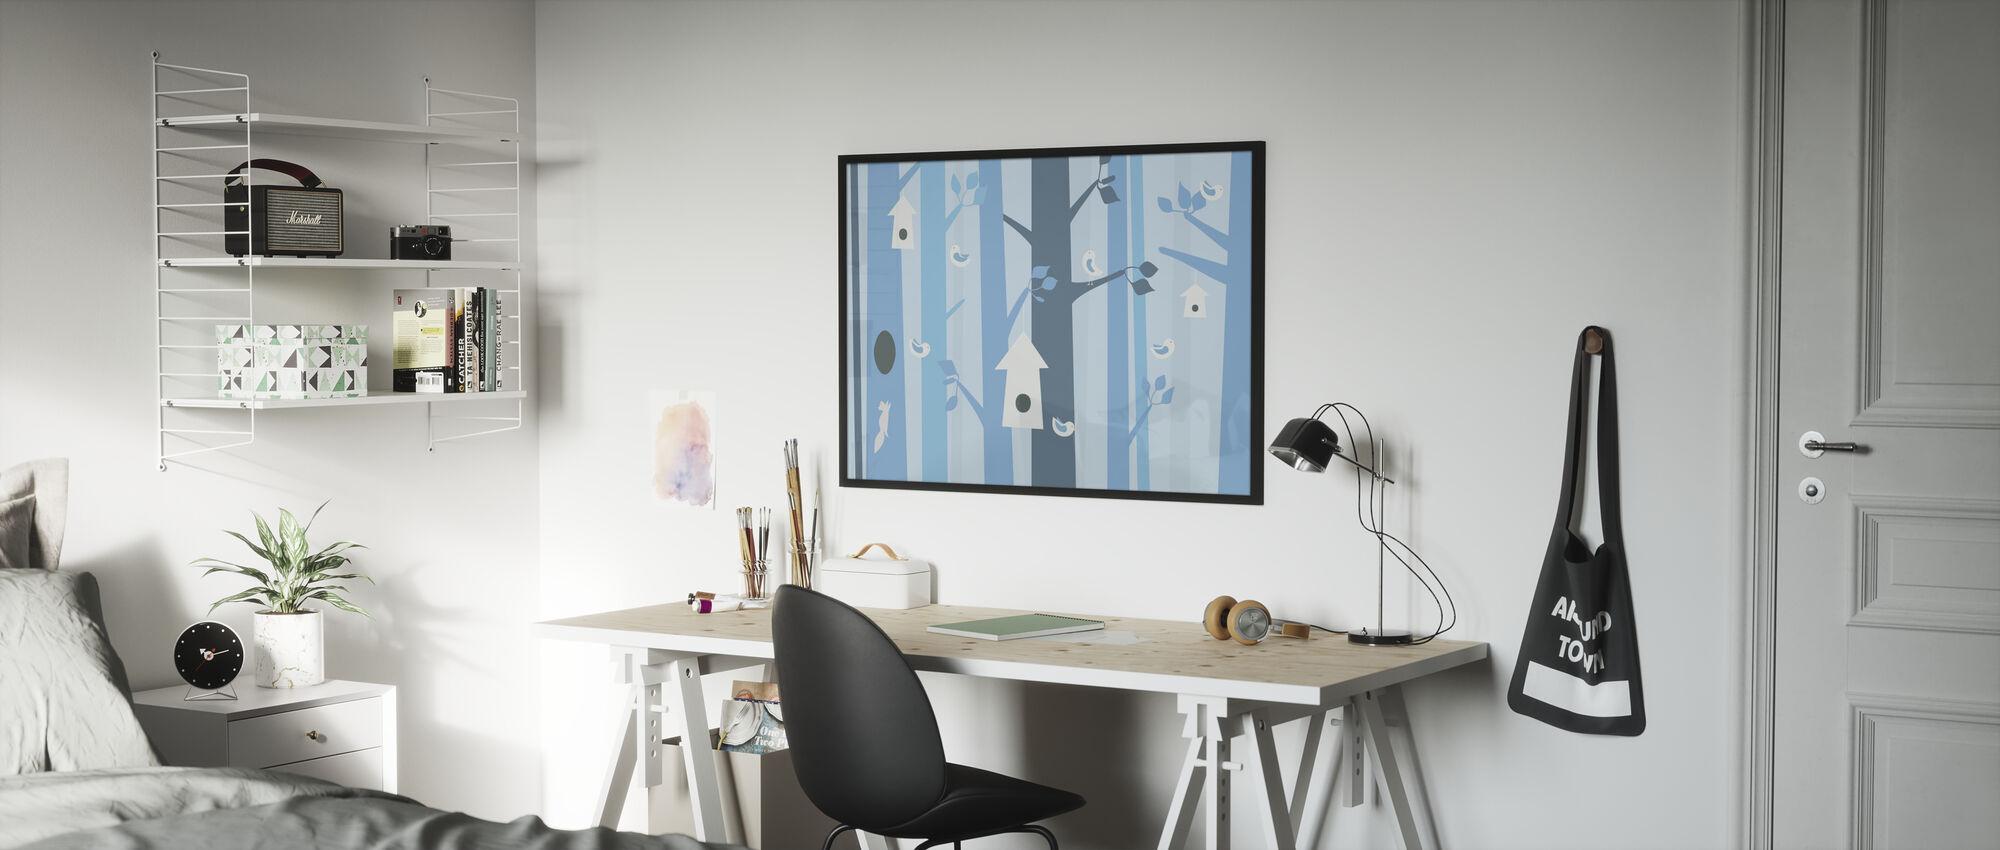 Vogelbos - Blauw - Ingelijste print - Kinderkamer